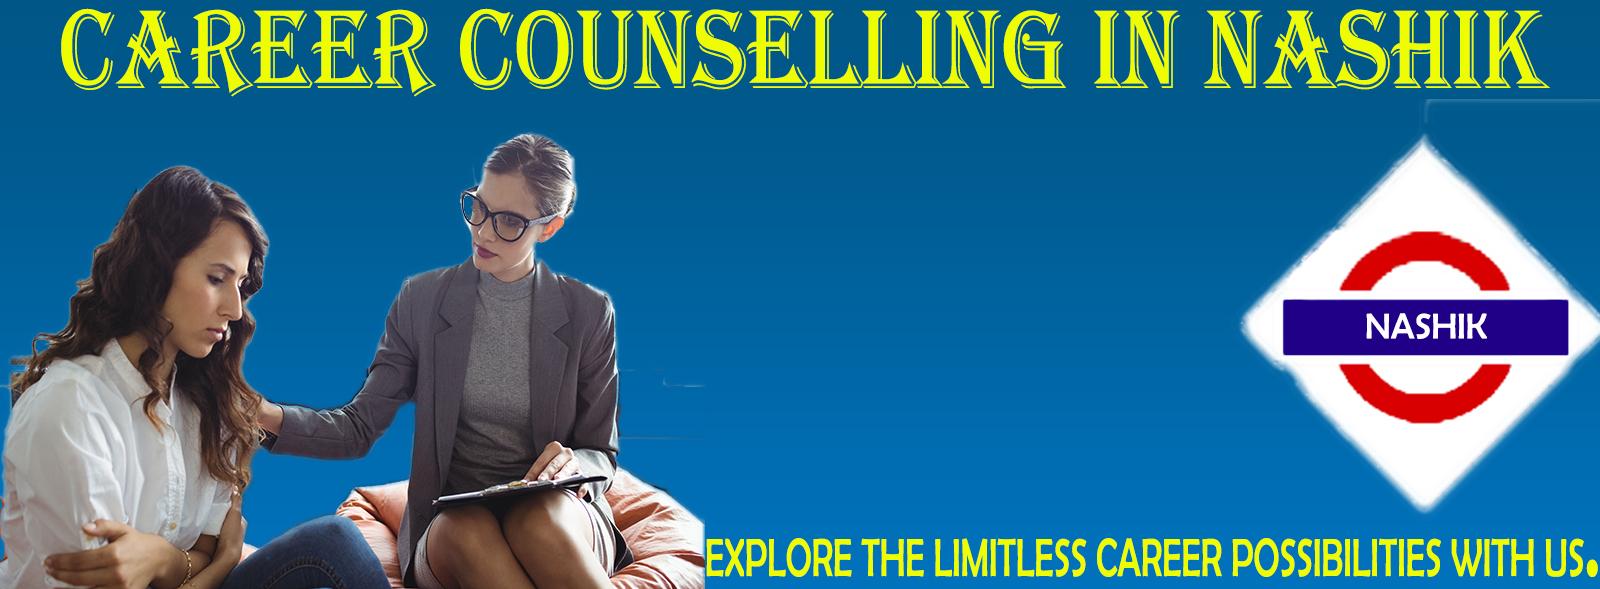 career counselling in nashik